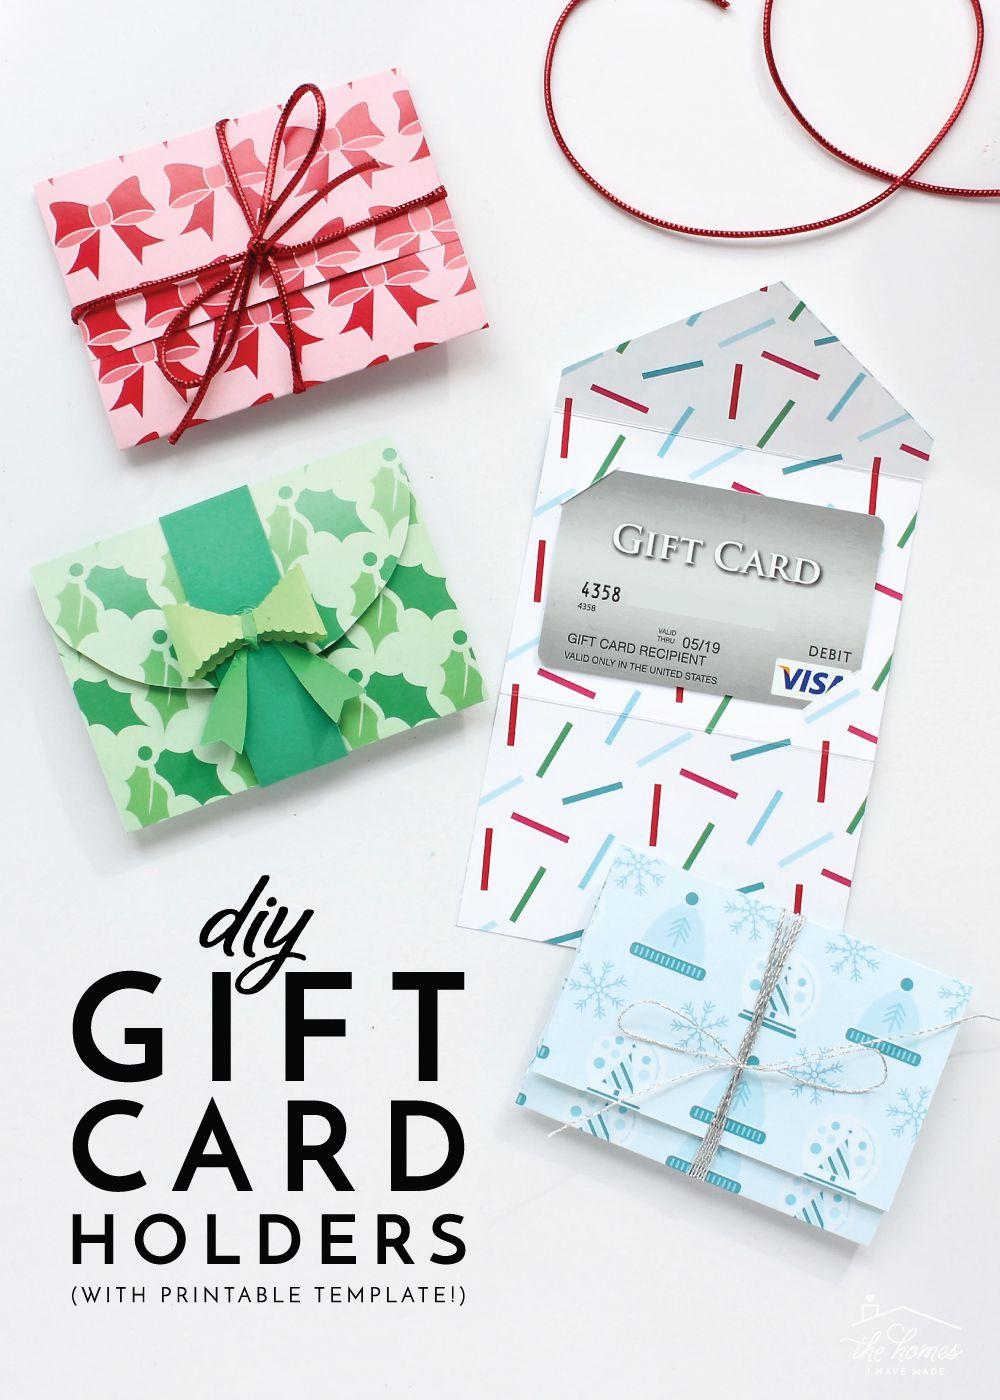 010 Stunning Gift Card Envelope Template Idea  Templates Voucher Diy Free PrintableFull